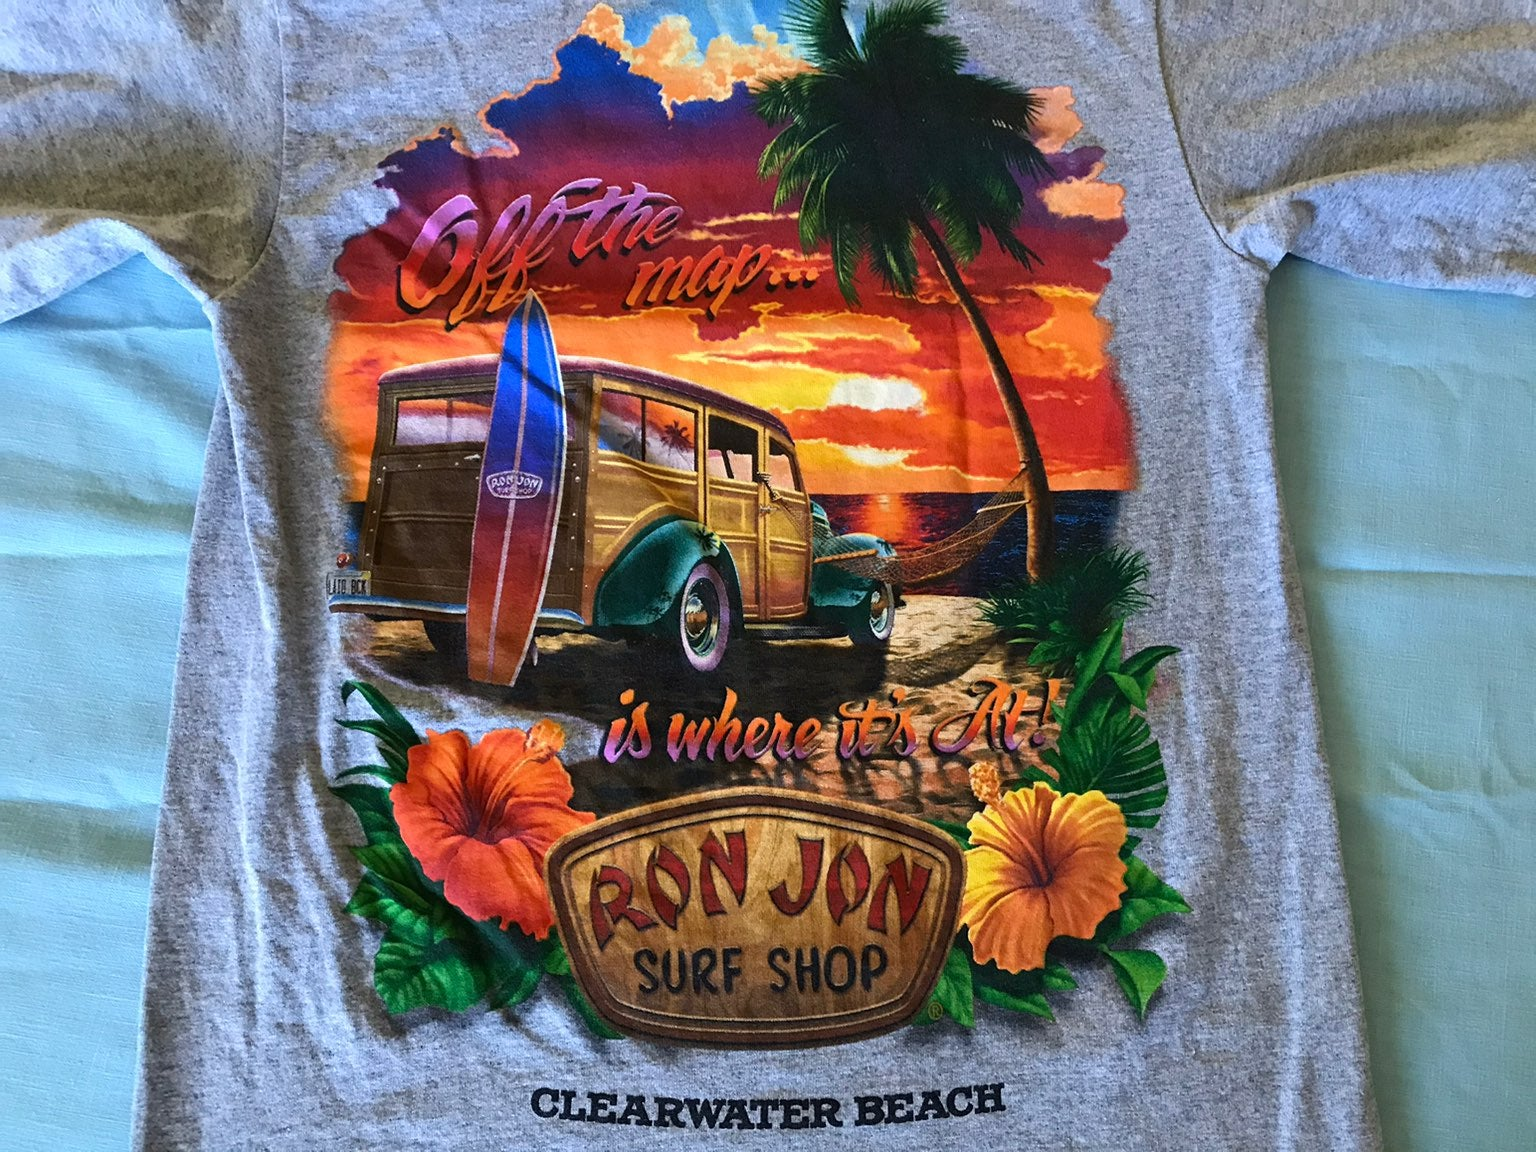 Ron Jon T shirt Small